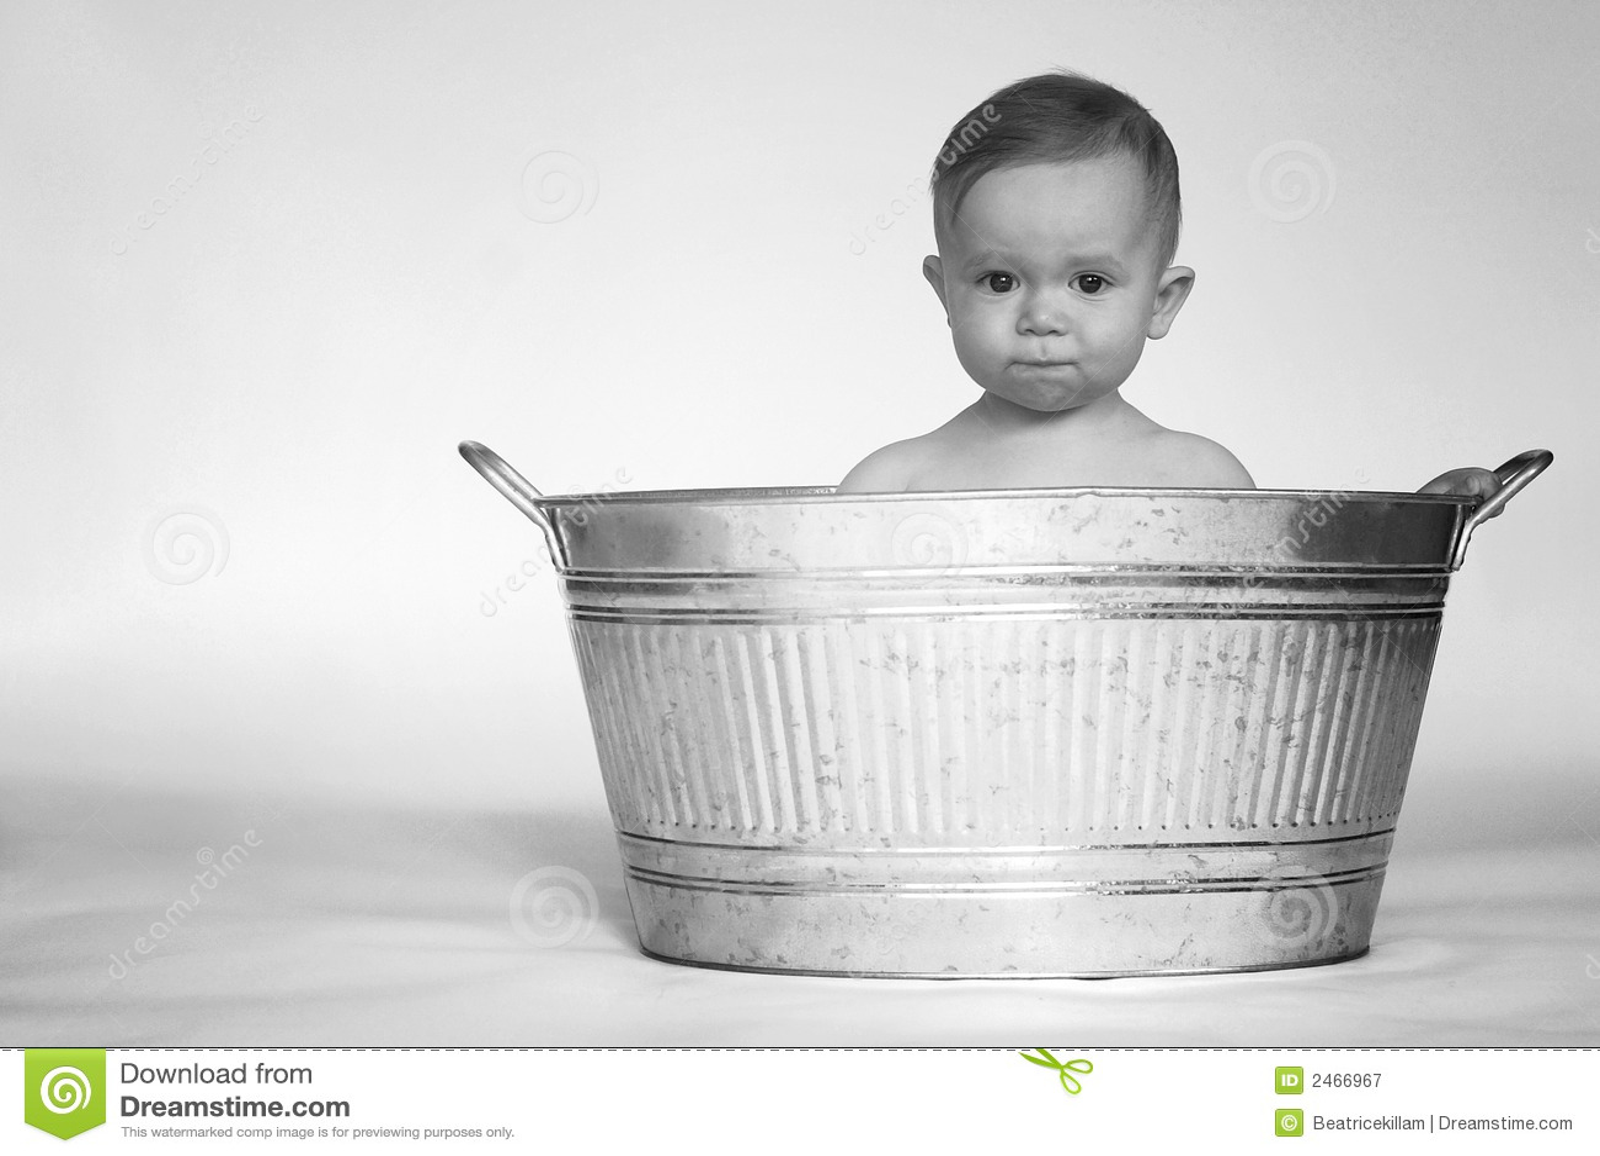 Tub Baby stock image. Image of skin, innocence, galvanized - 2466967